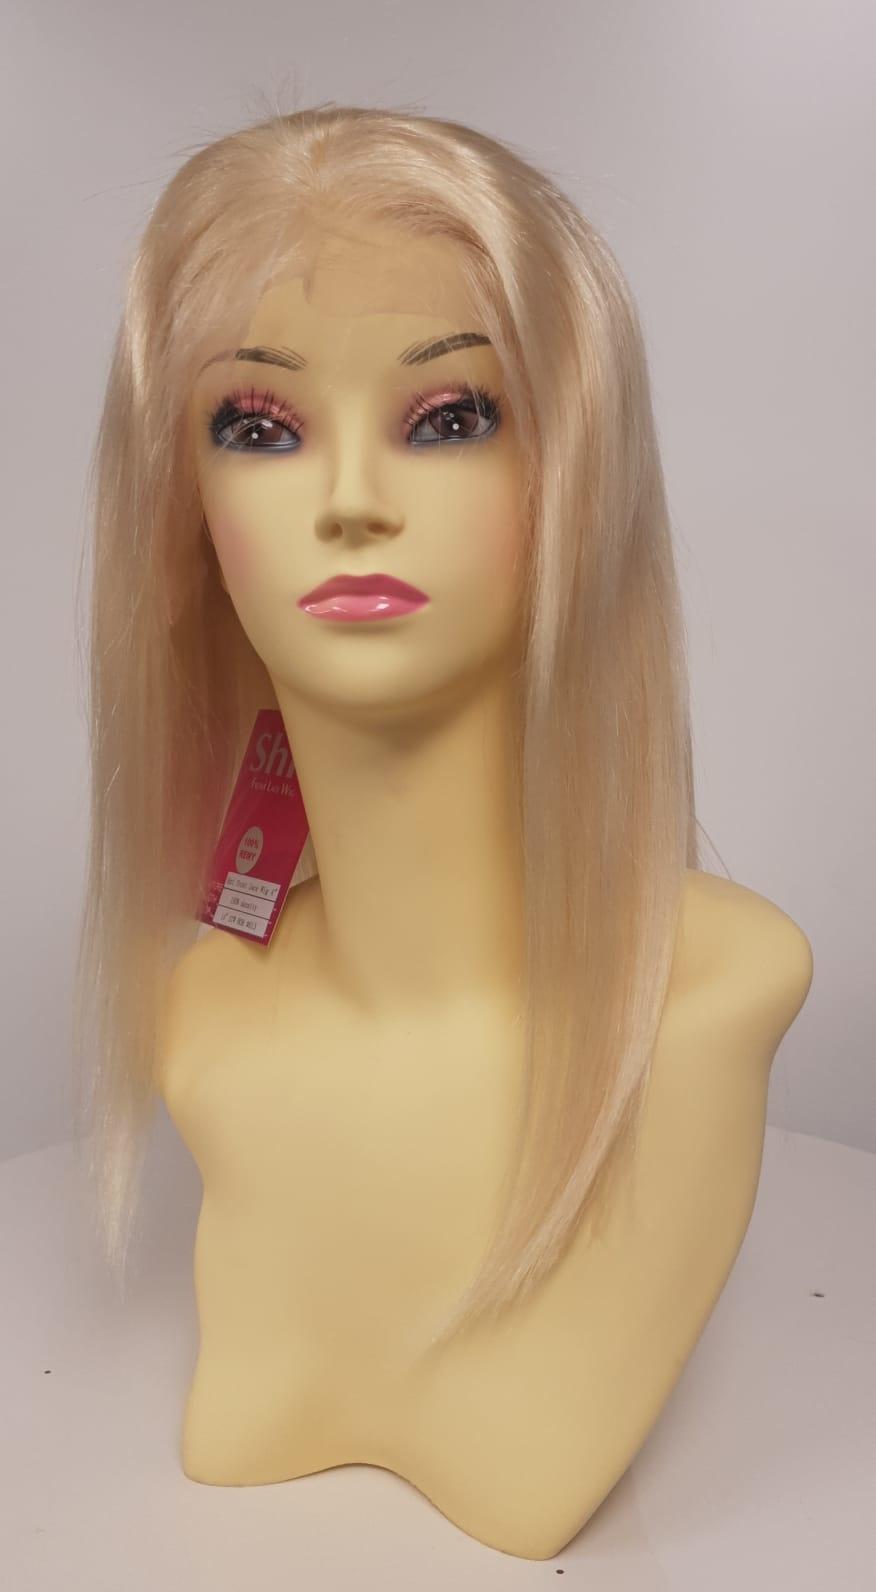 Shri SilverFox Indian Shri Front Lace Wig - BOB - BLOND